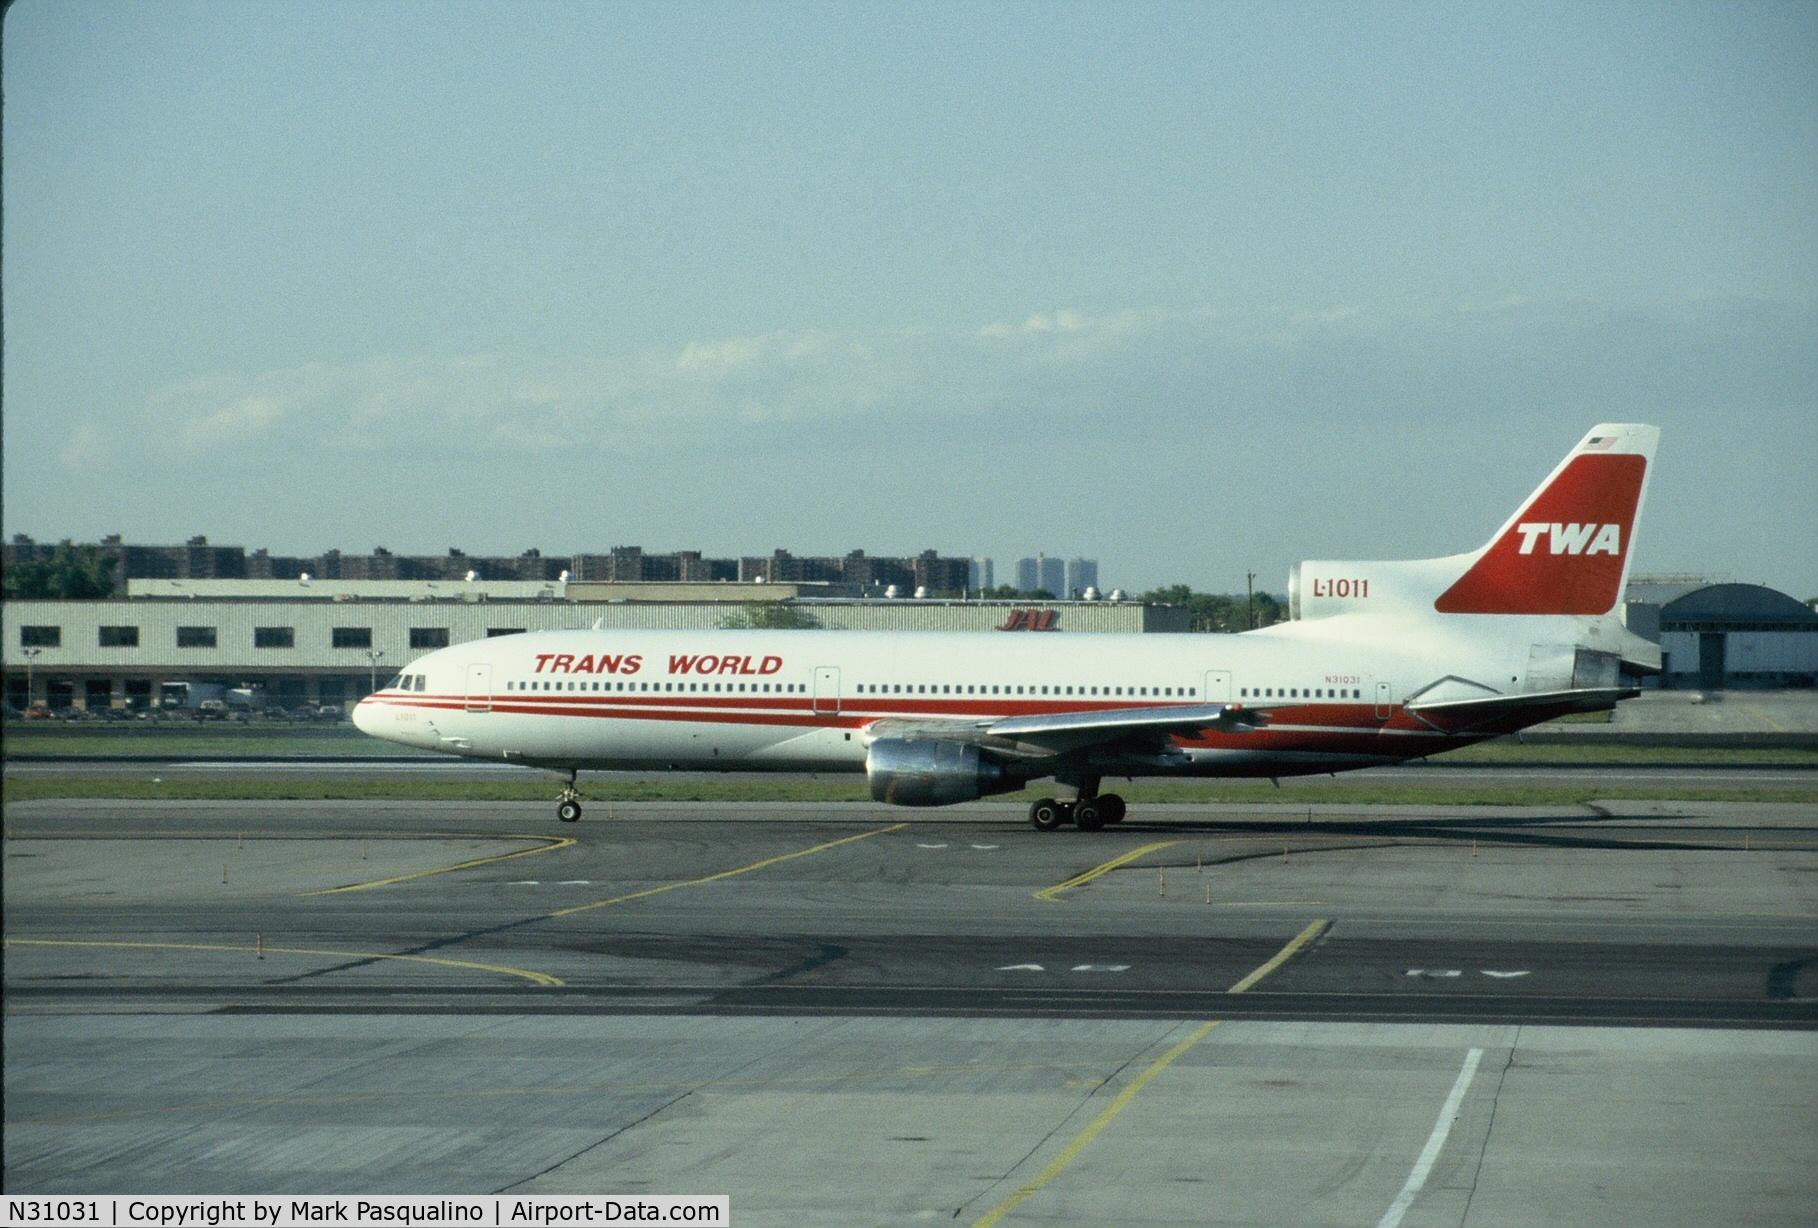 N31031, 1982 Lockheed L-1011-385-1-15 TriStar 100 C/N 193B-1115, Lockheed L-1011